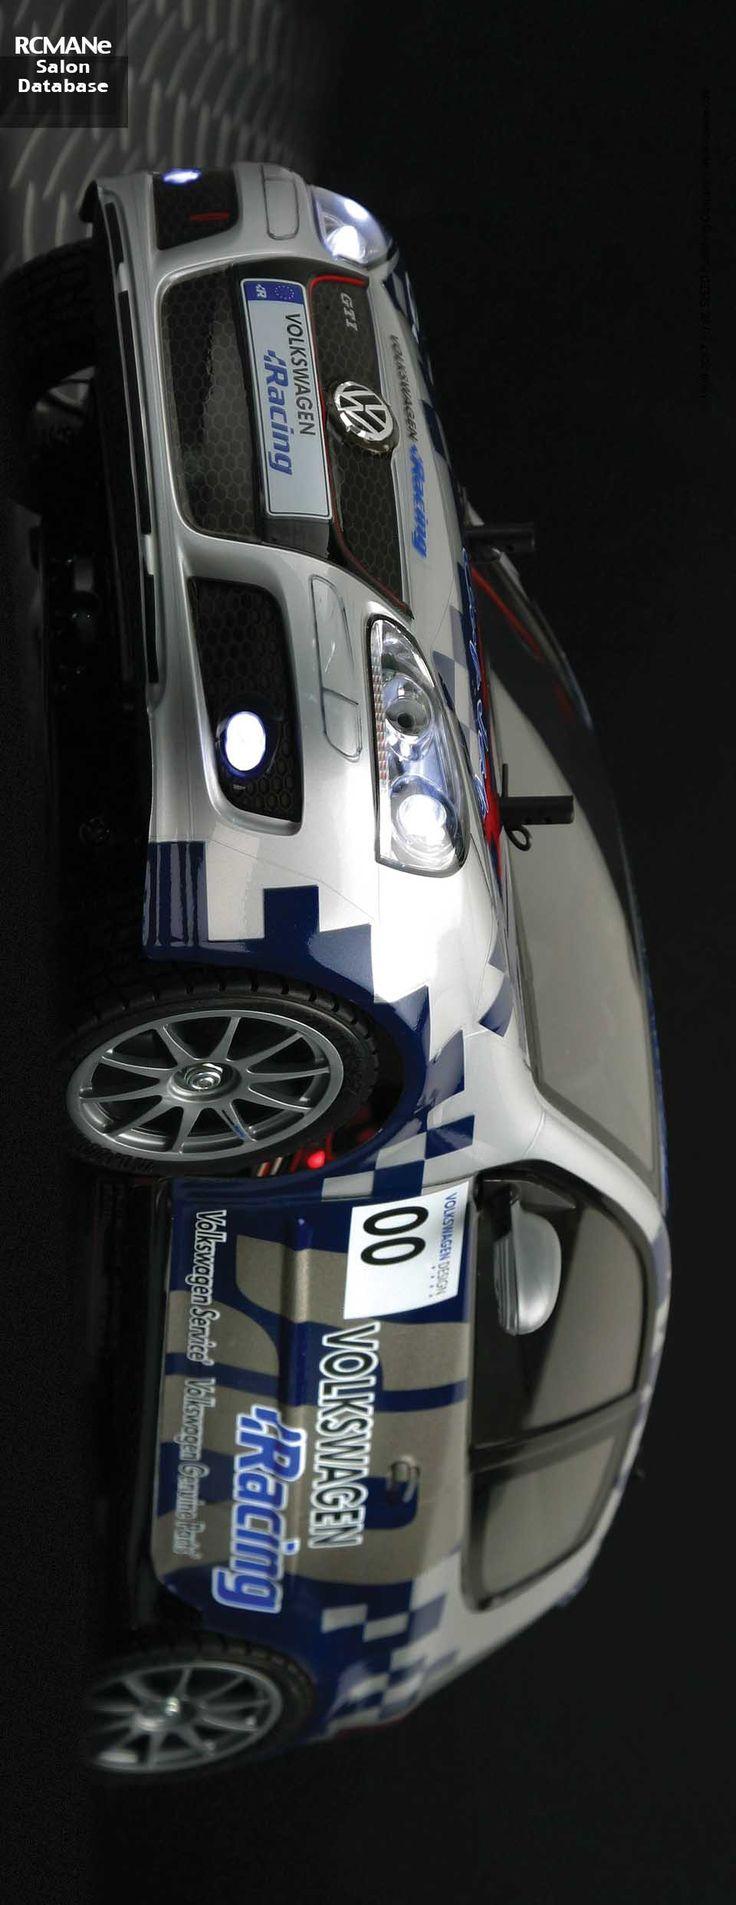 Sa086_tamiya volkswagen golf gti cup car tt 01 type e chassis